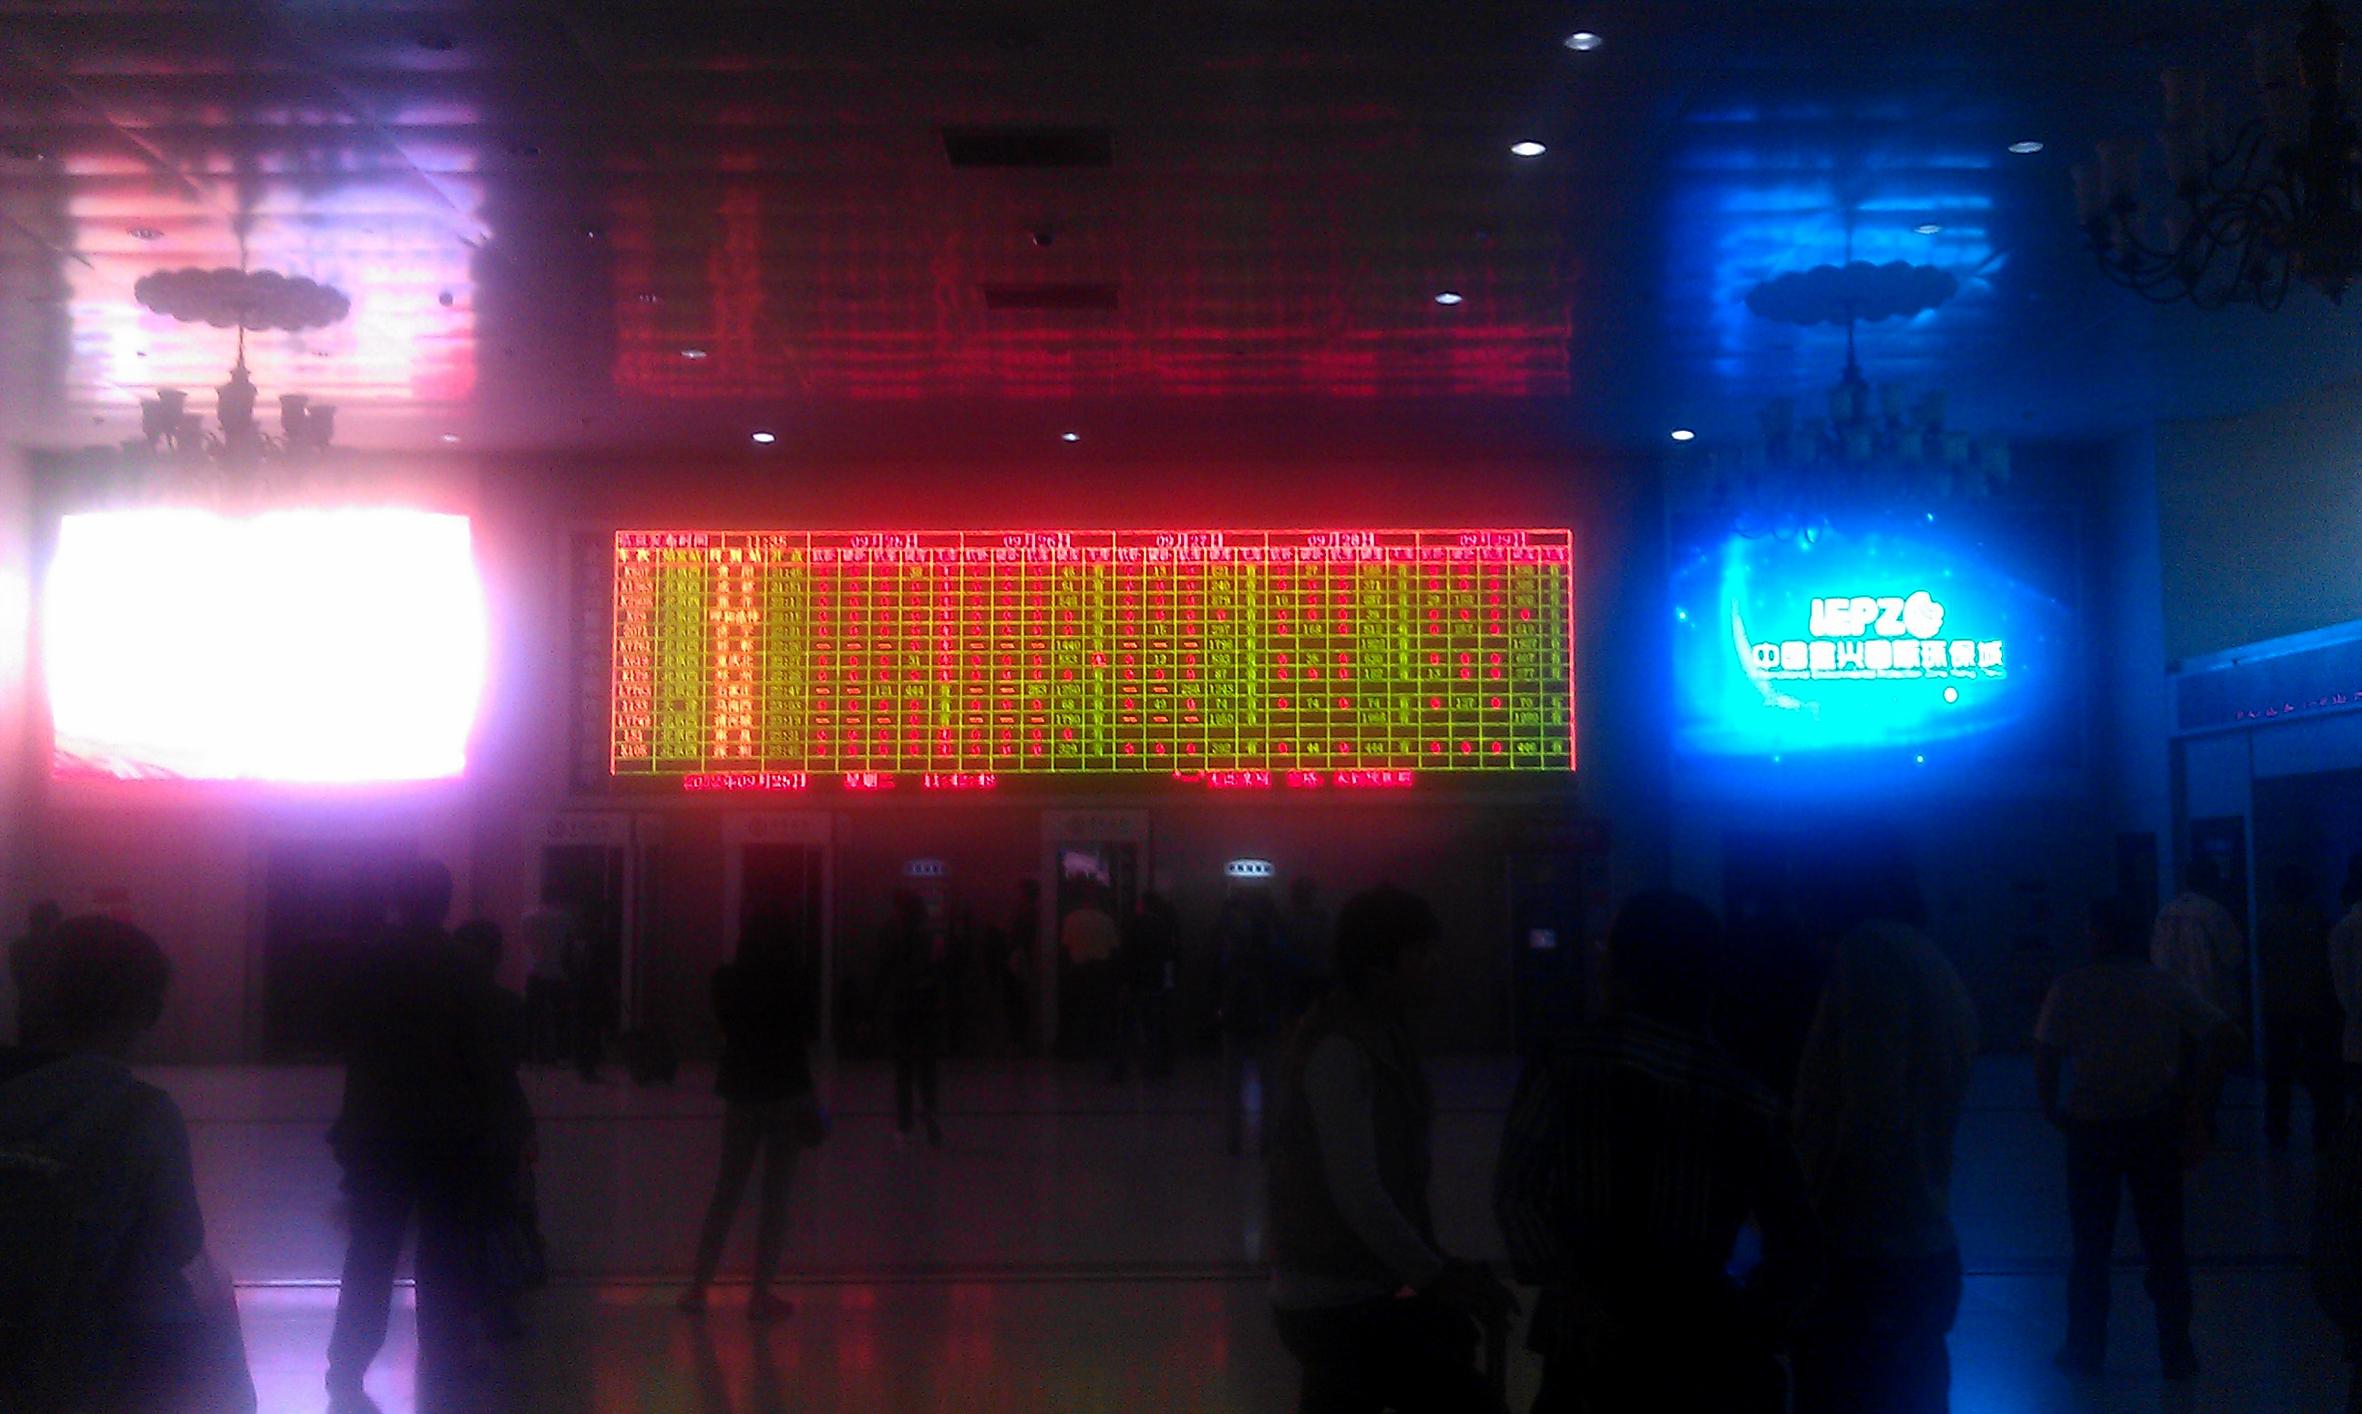 2012-09-25-K01-railway-station (1).jpg